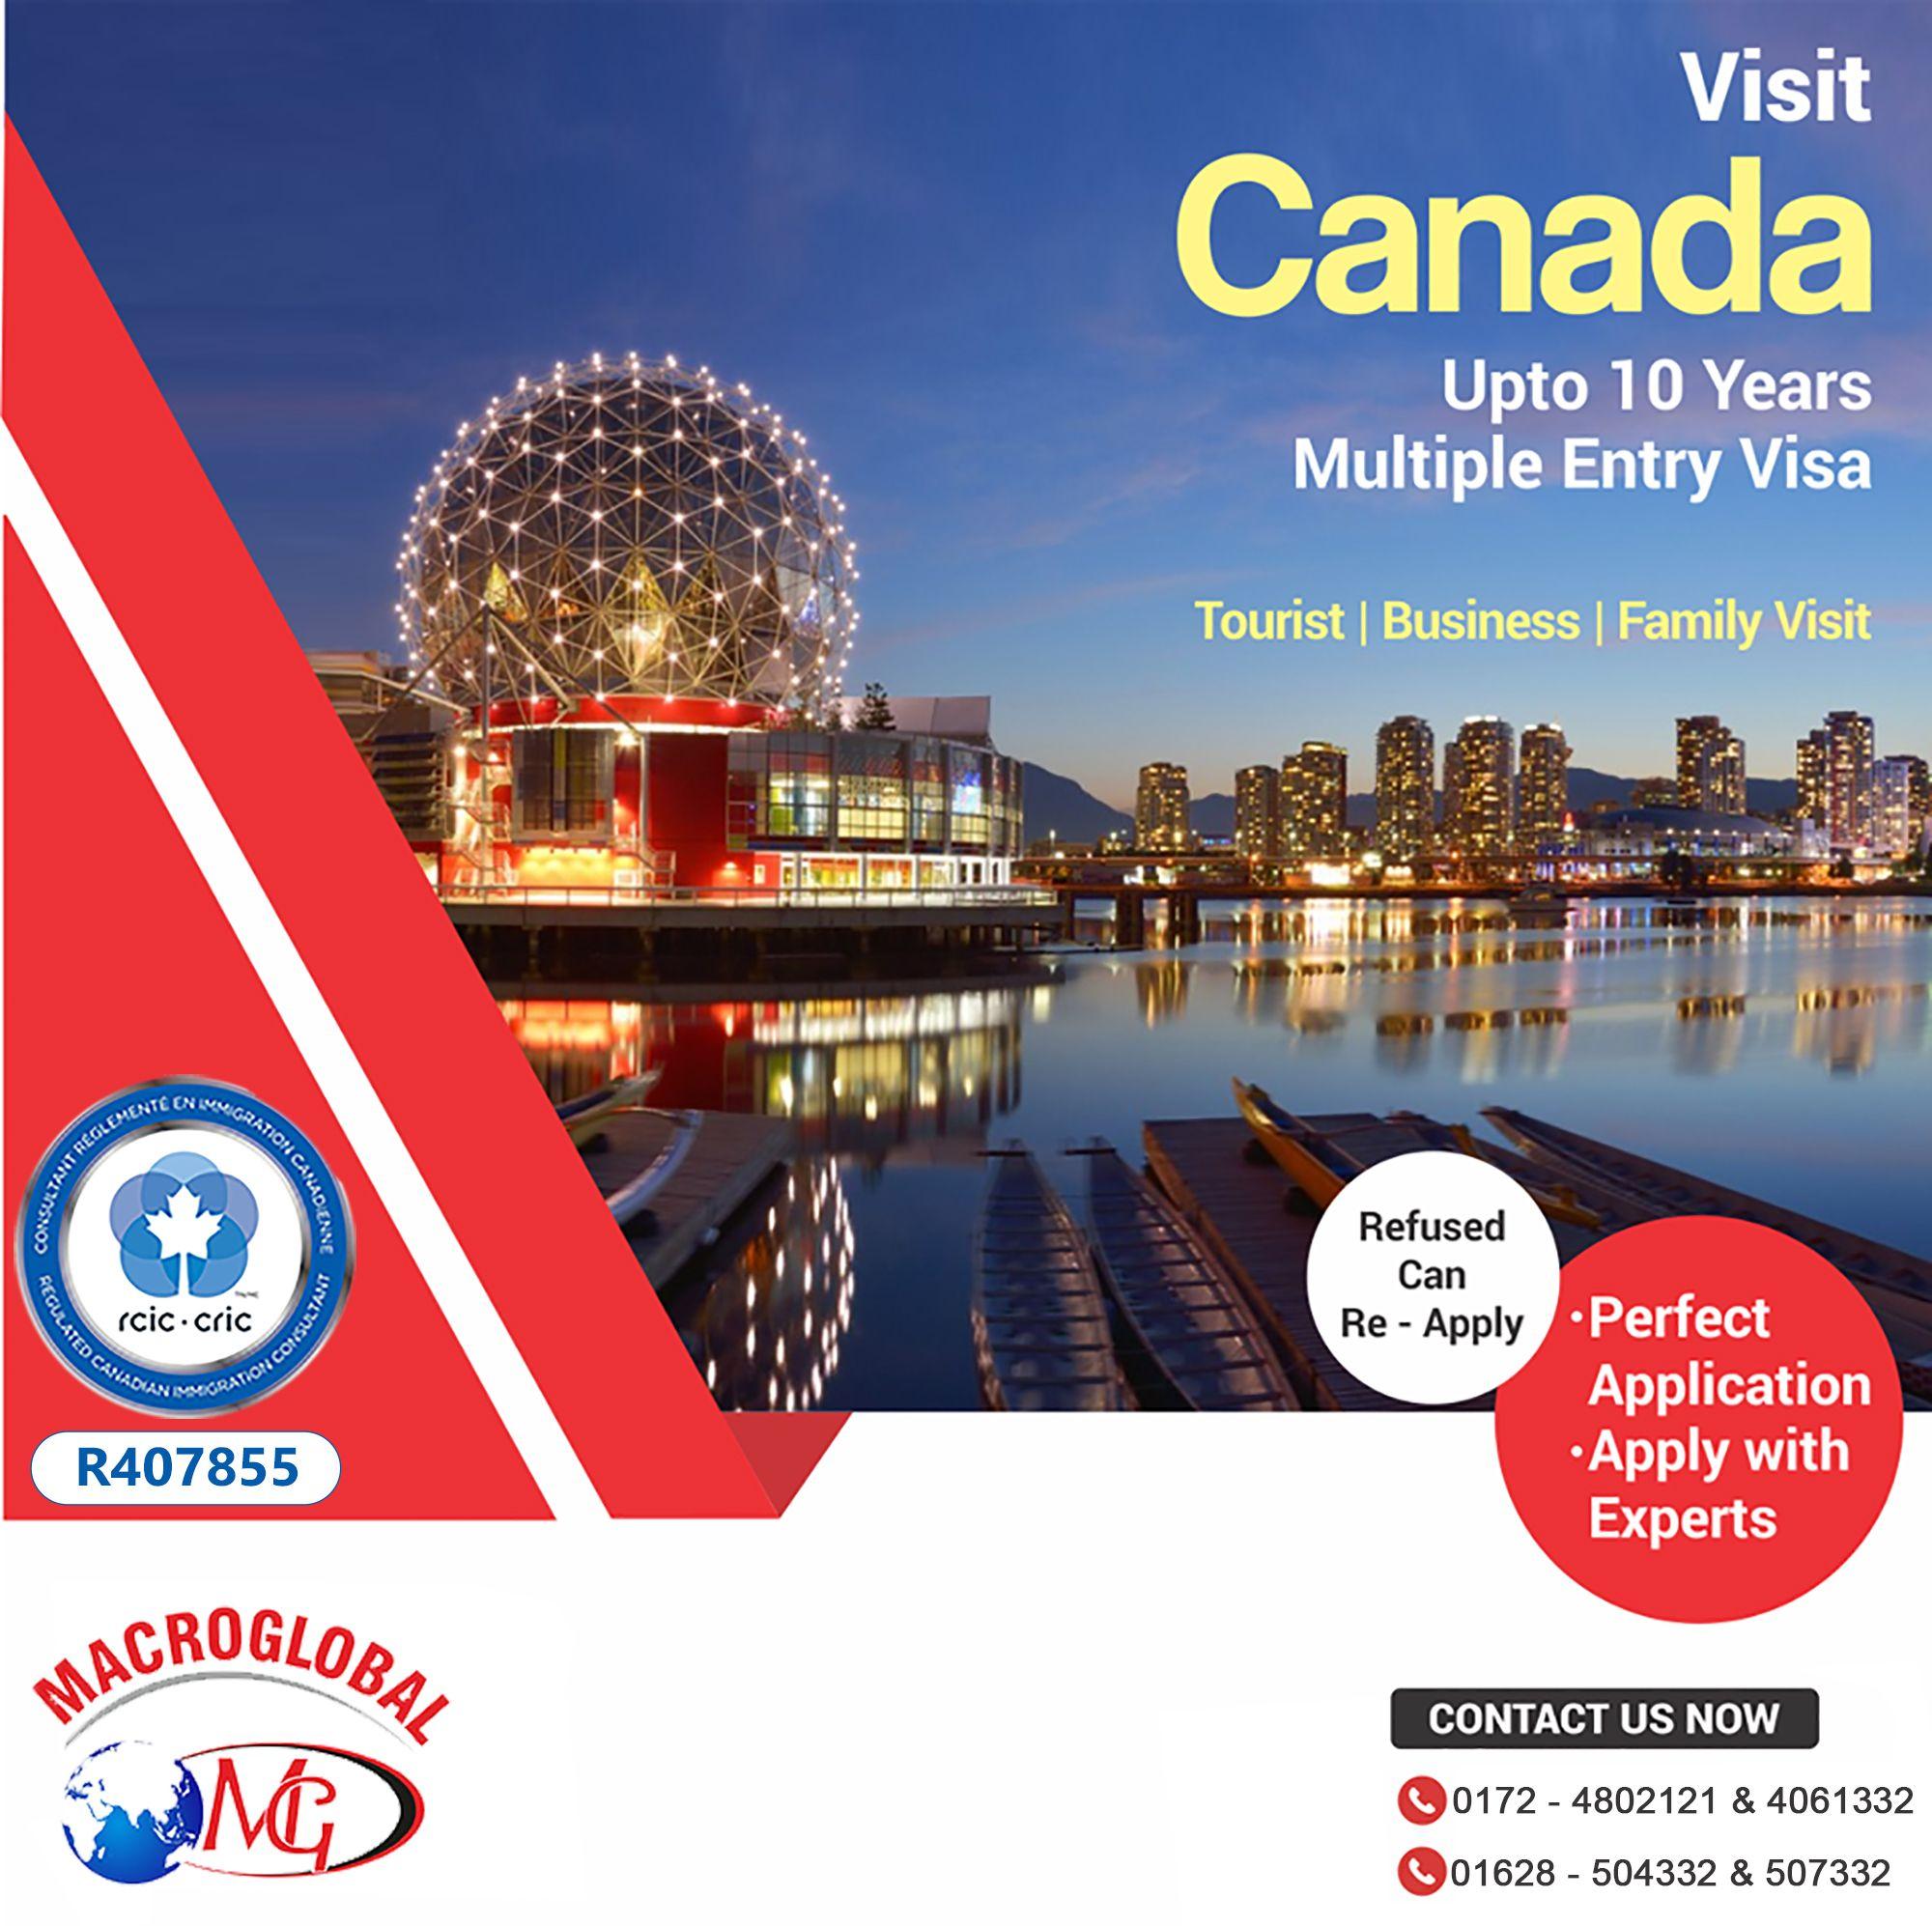 Canada ICCRC multiple visa with Macroglobal